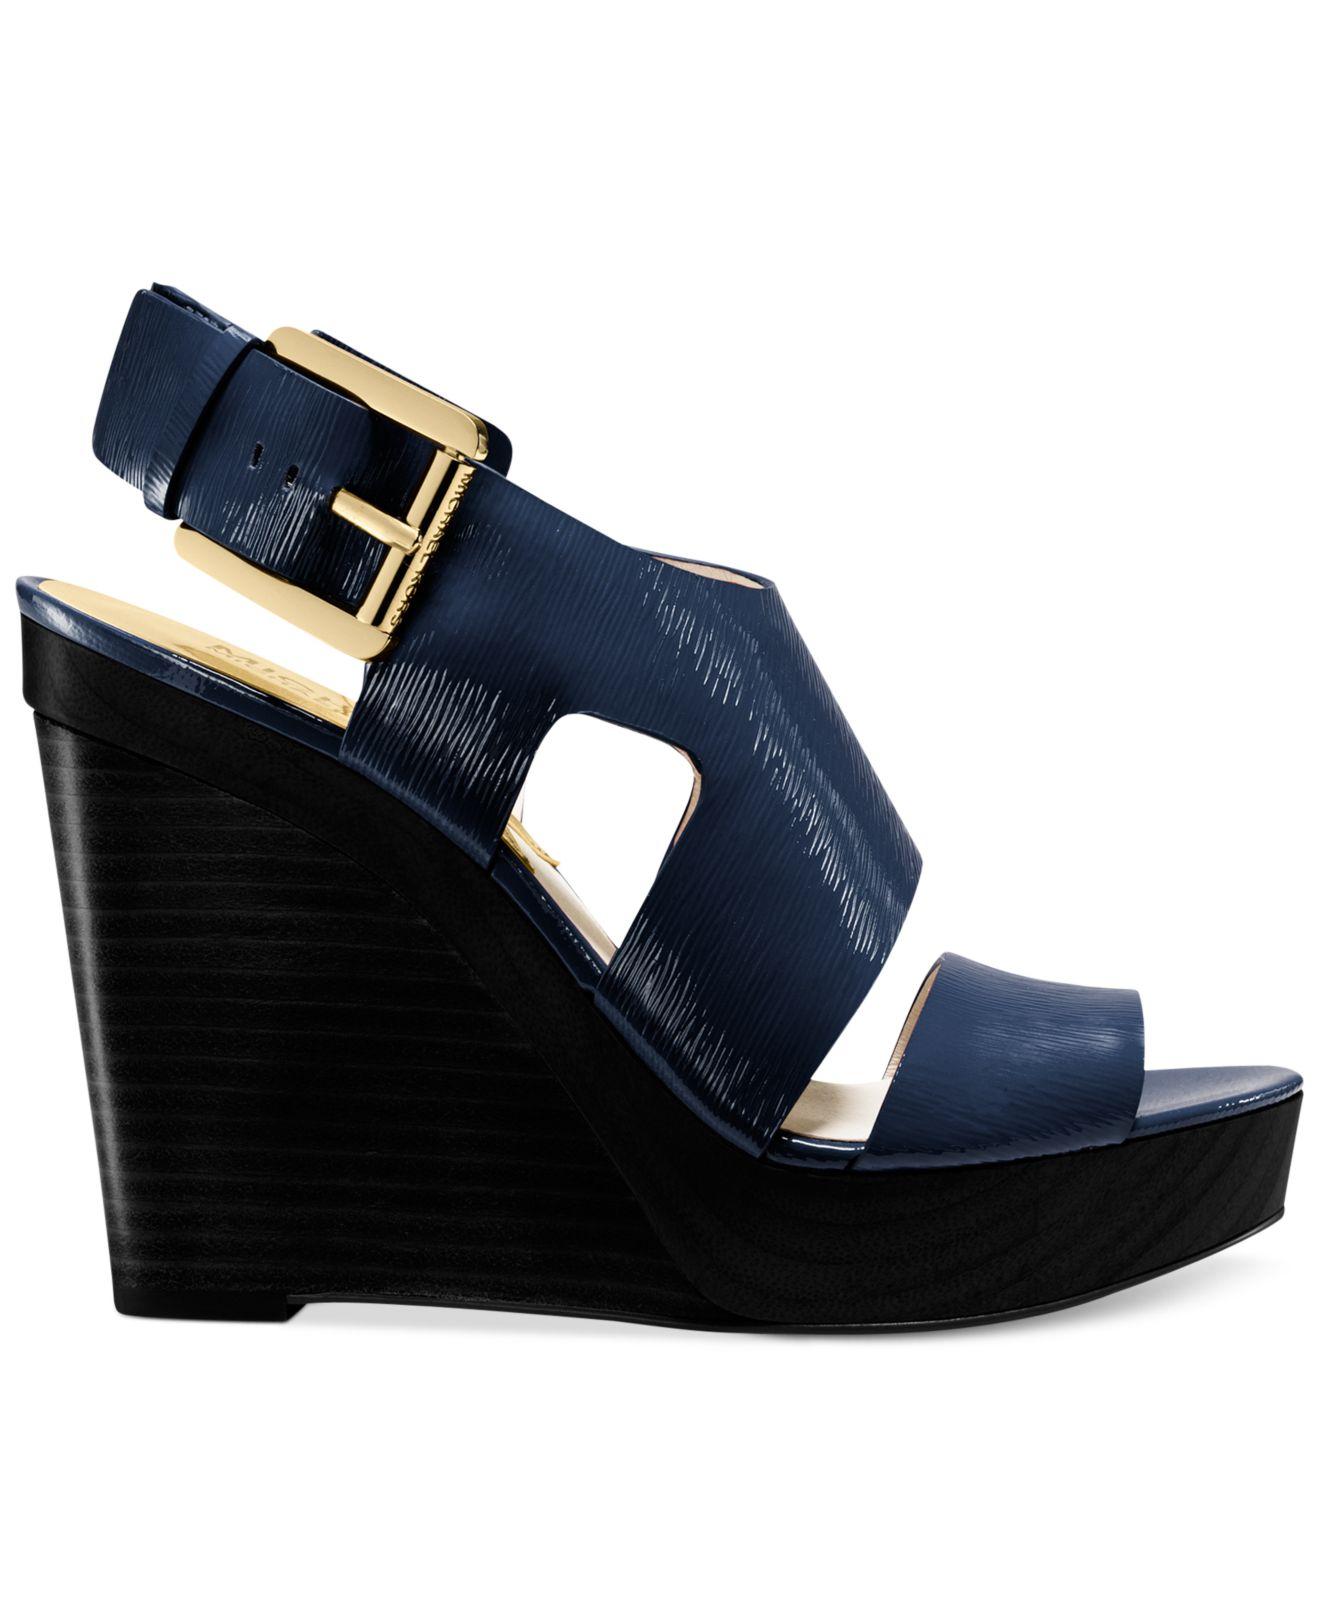 Lyst - Michael Kors Michael Carla Platform Wedge Sandals